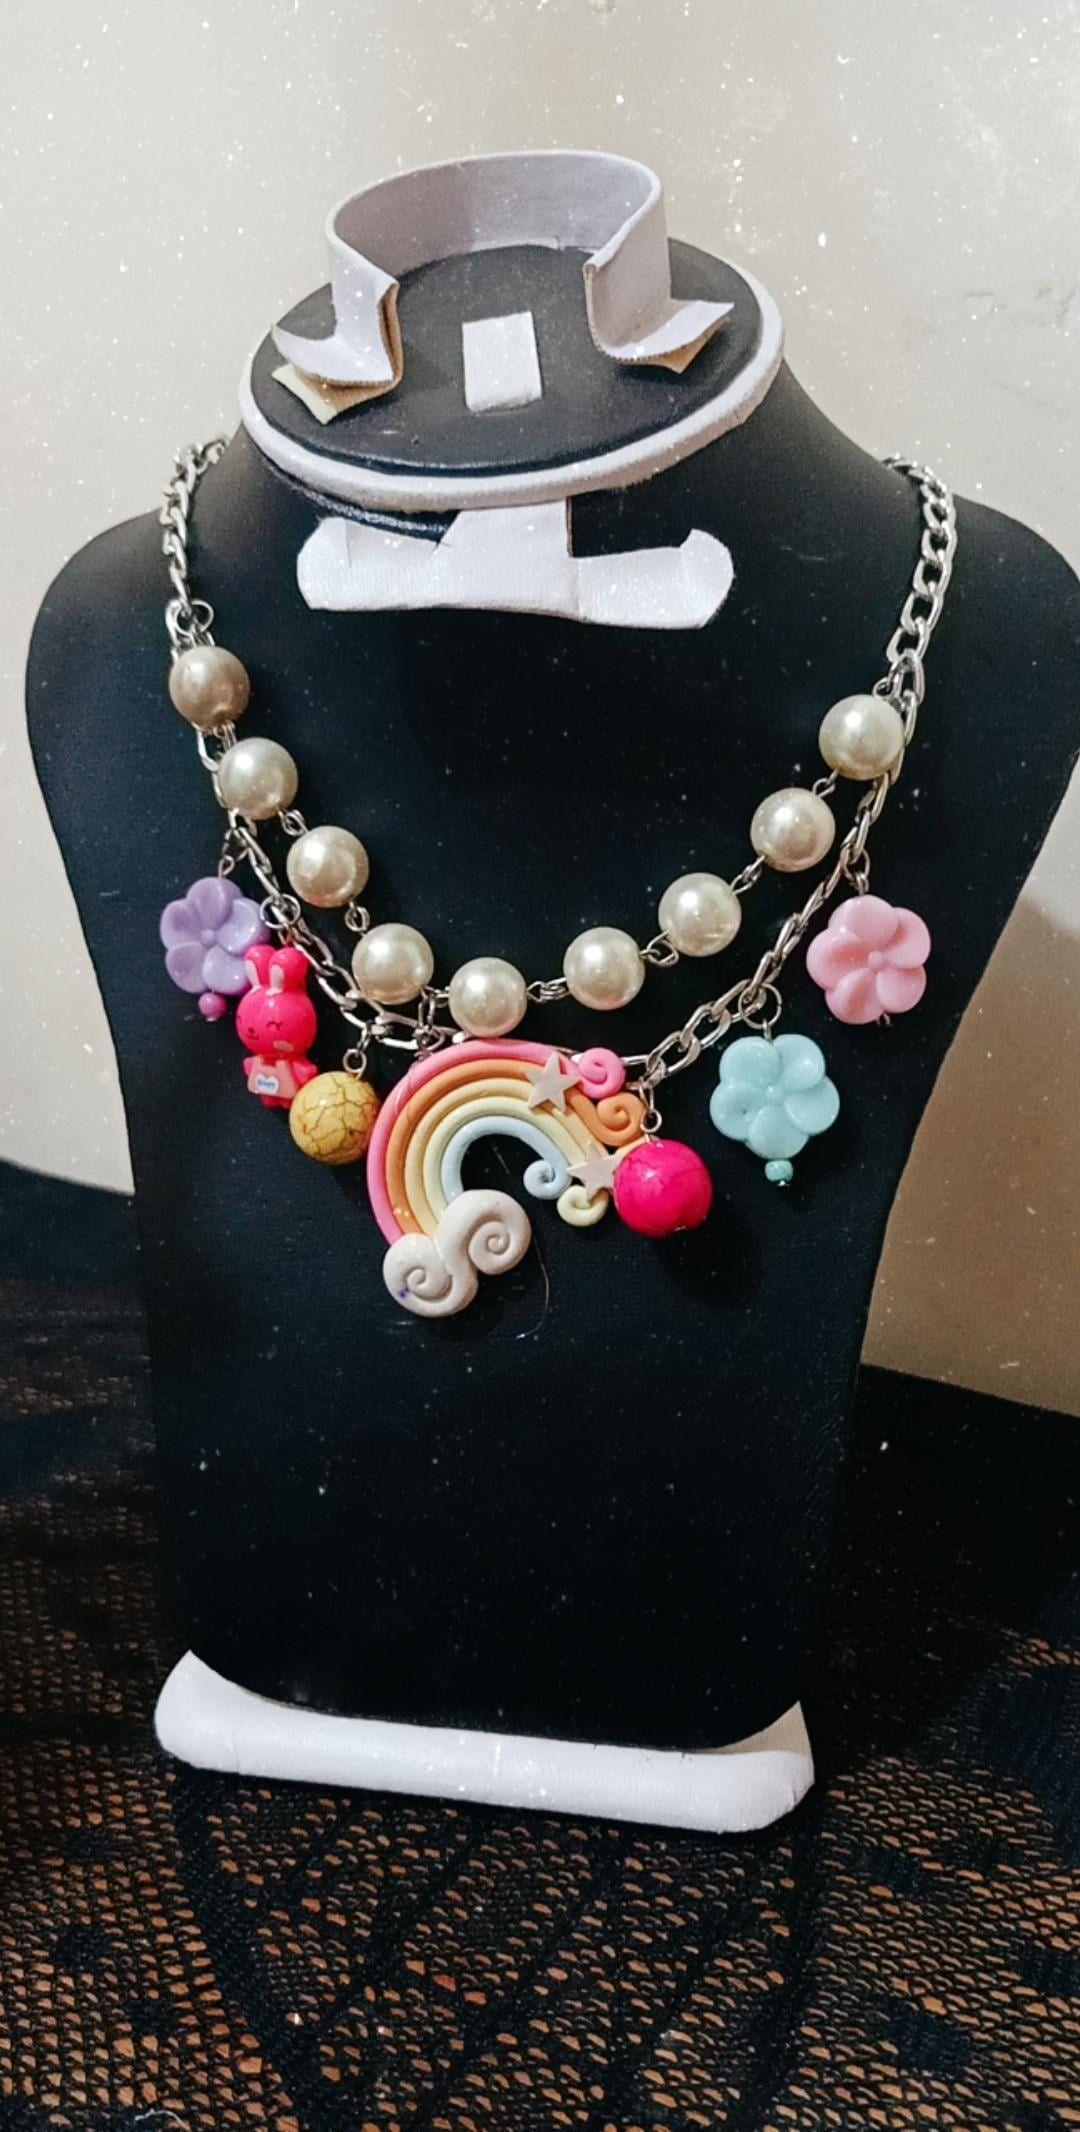 اكسسوارات بنات اكسسورات اطفال Statement Necklace Necklace Jewelry